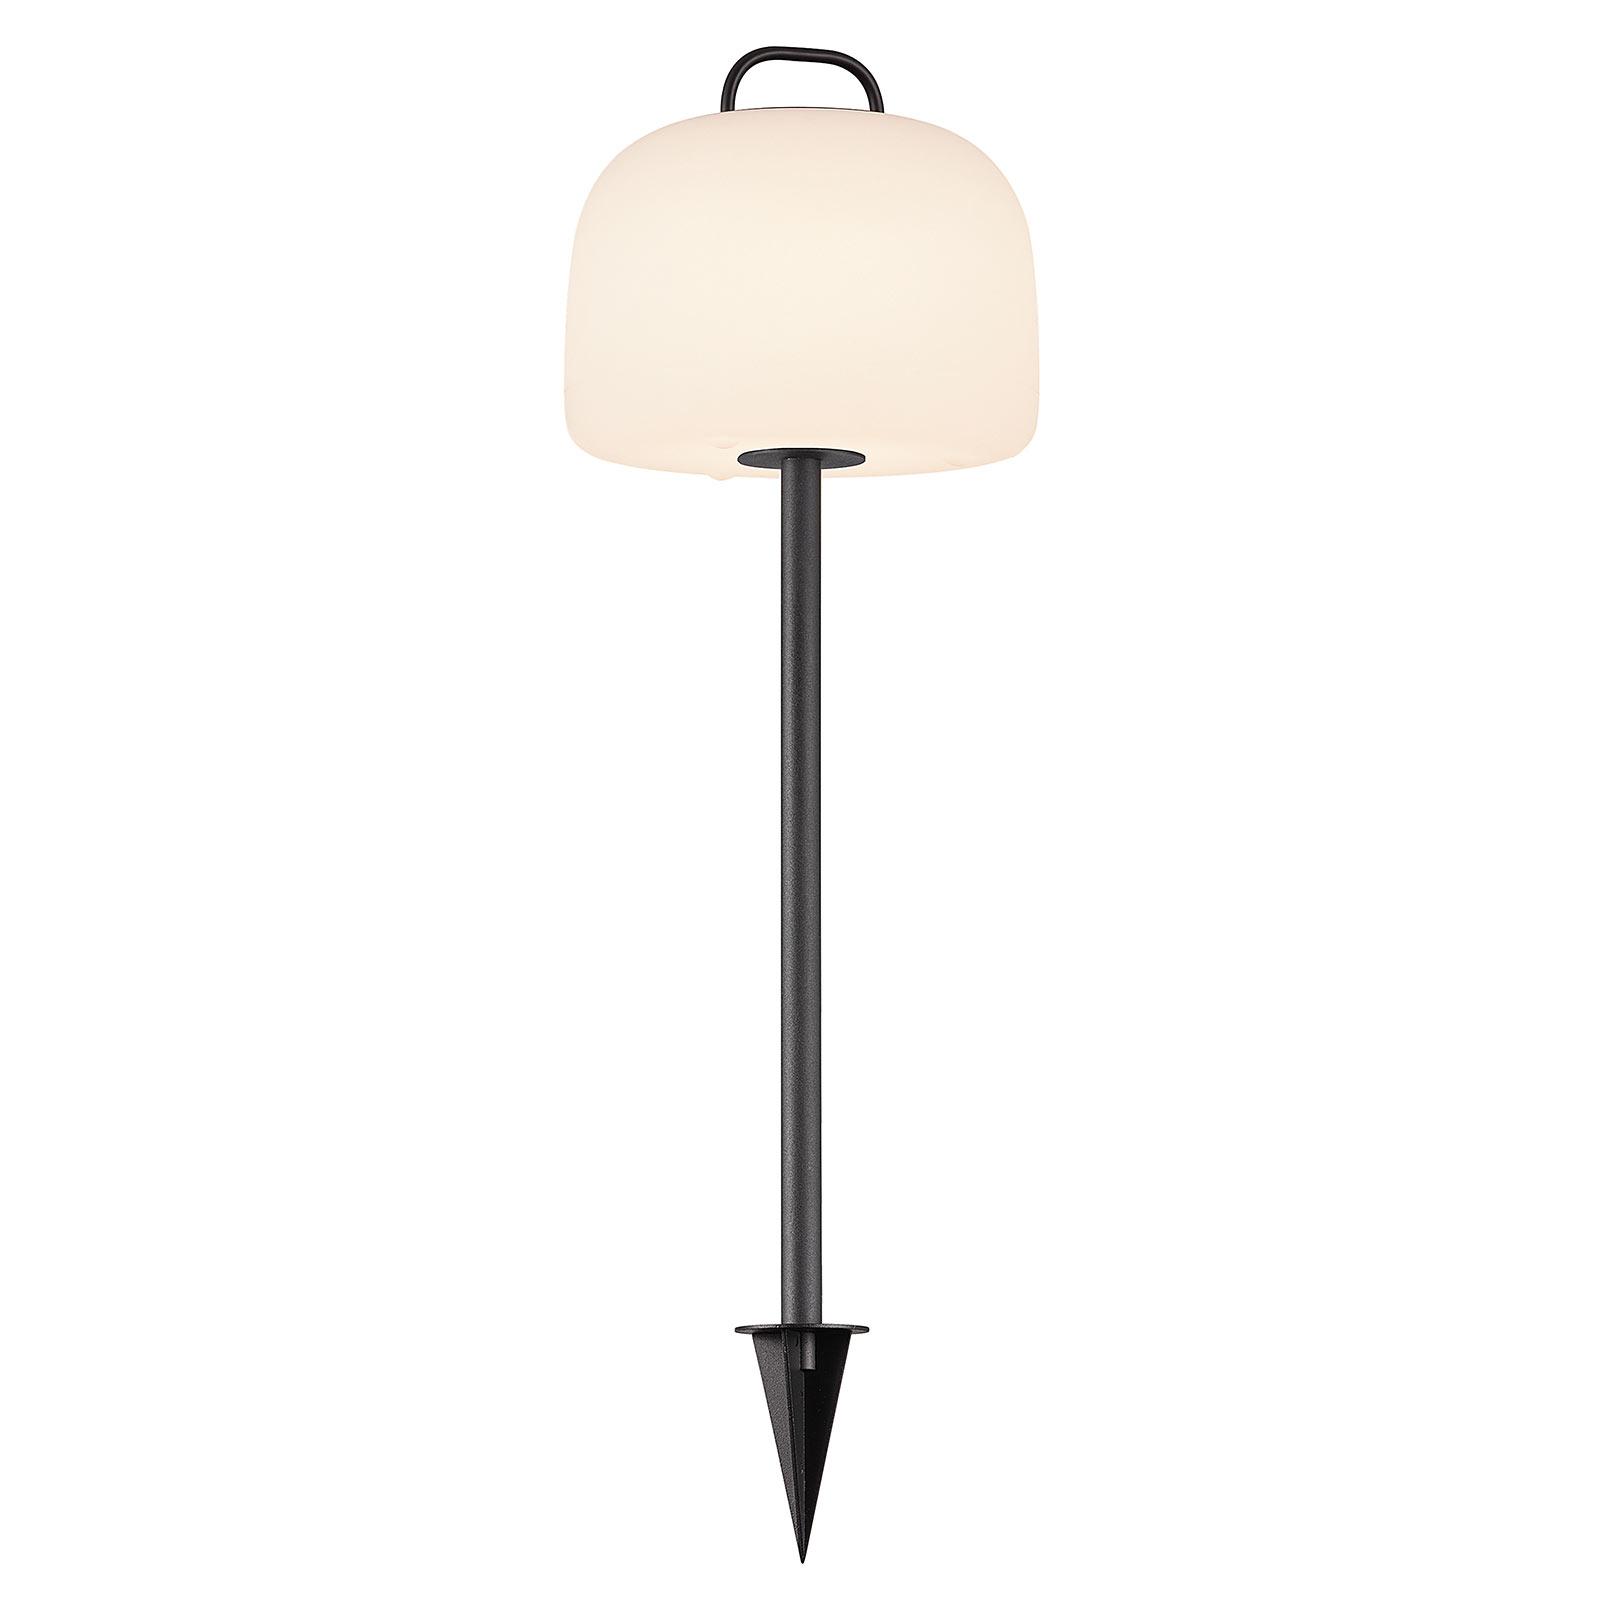 Lampada LED a picchetto Kettle paralume Ø 22 cm